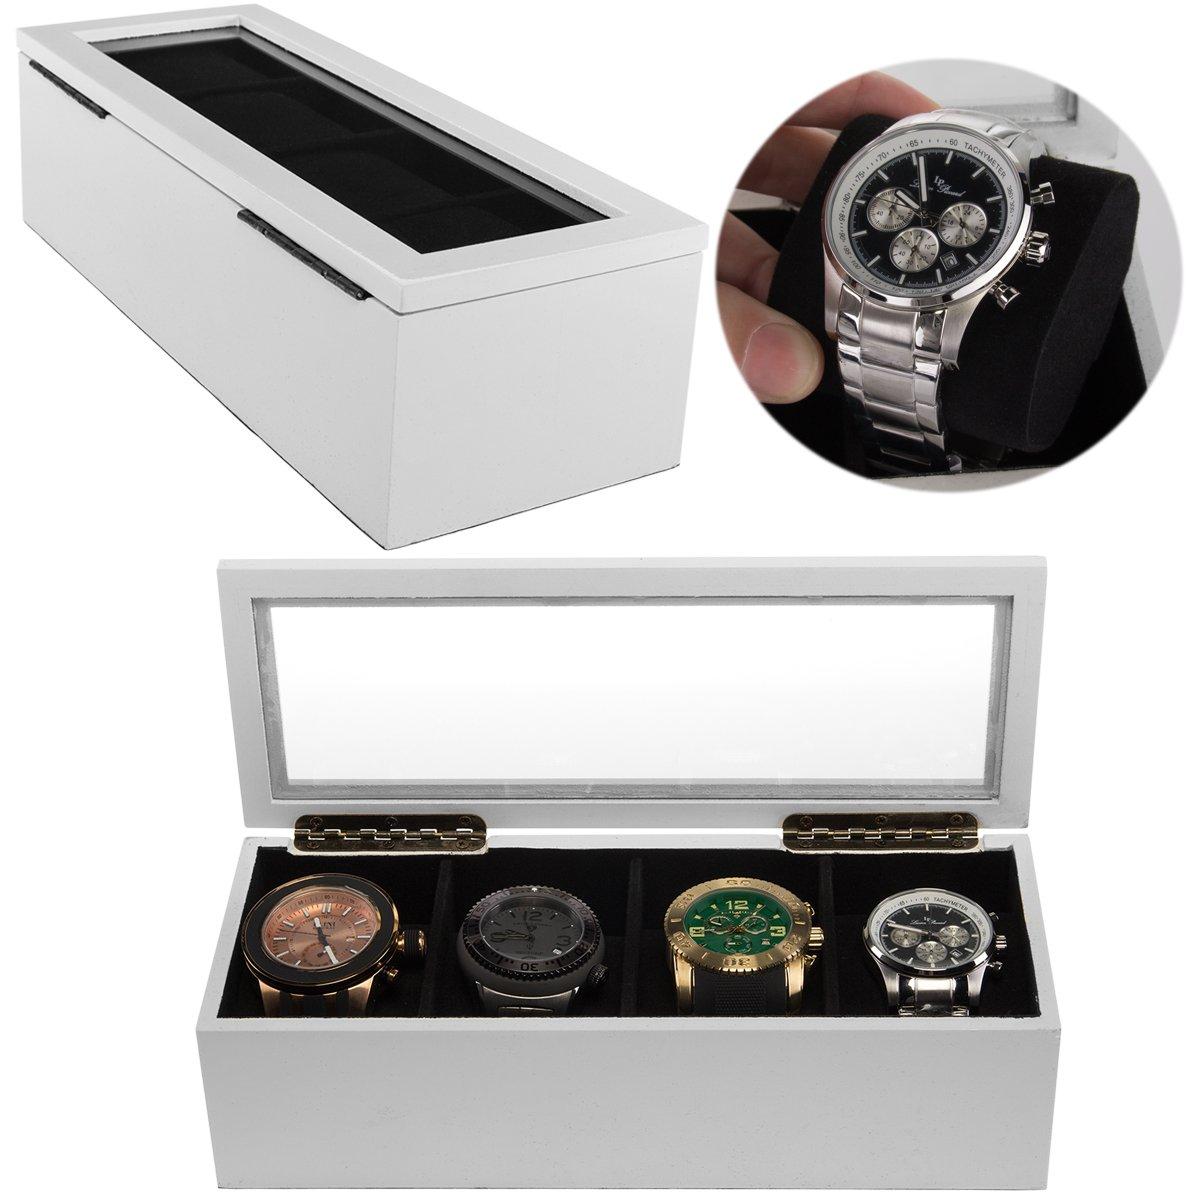 Concepts In Time (2 Pack) White Wrist Watch Holder Display Storage Boxes Organizer Case Soft Black Felt